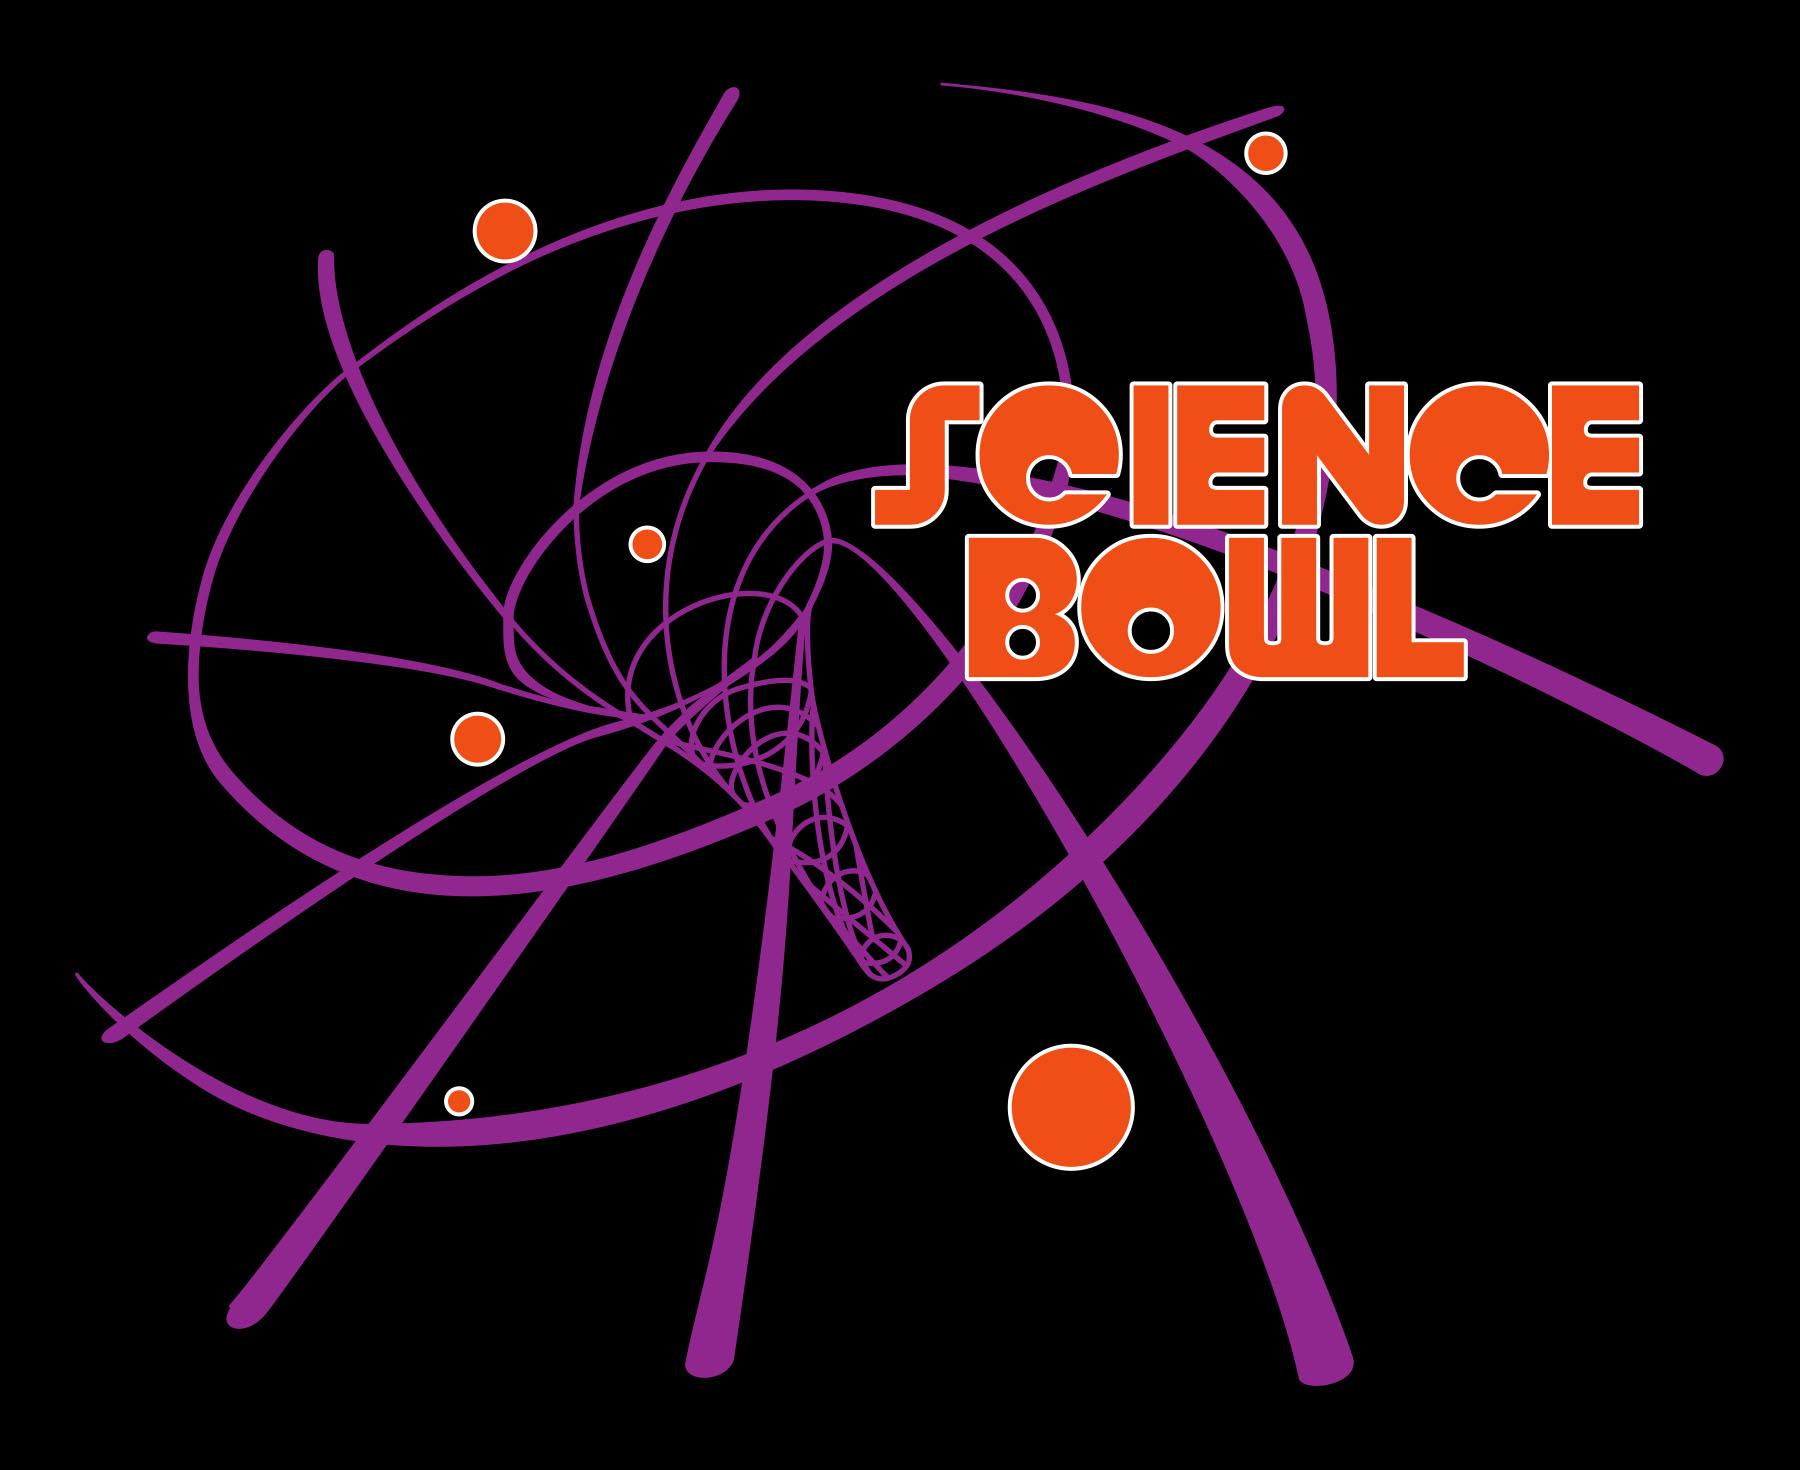 Science Bowl 2010 Branding